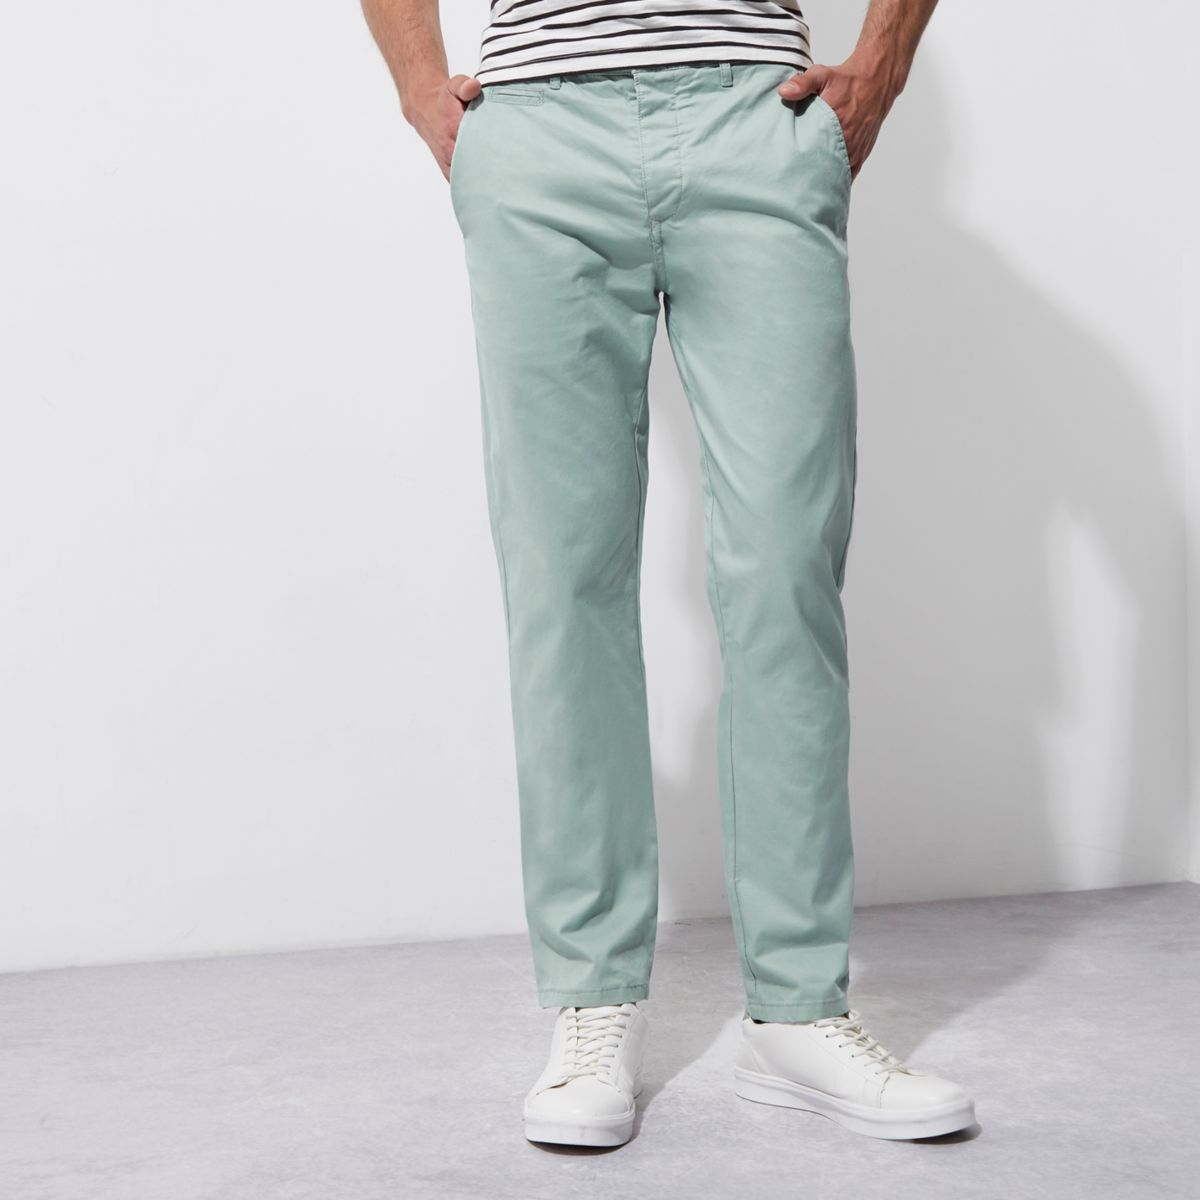 Light green slim chino pants